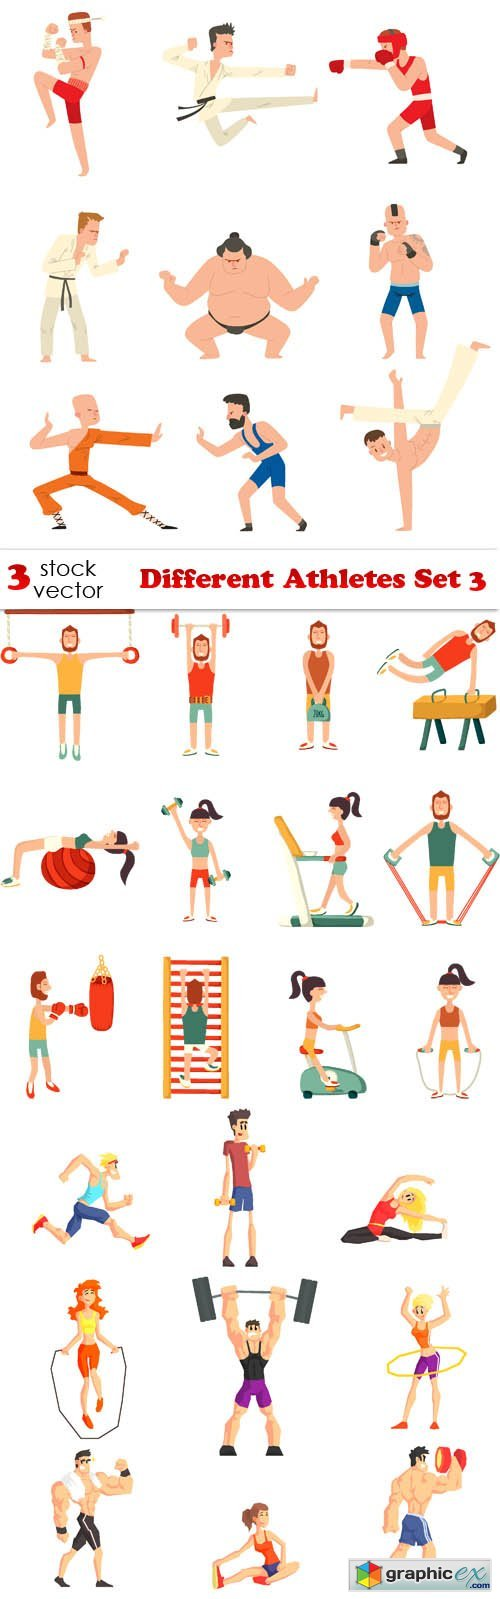 Different Athletes Set 3